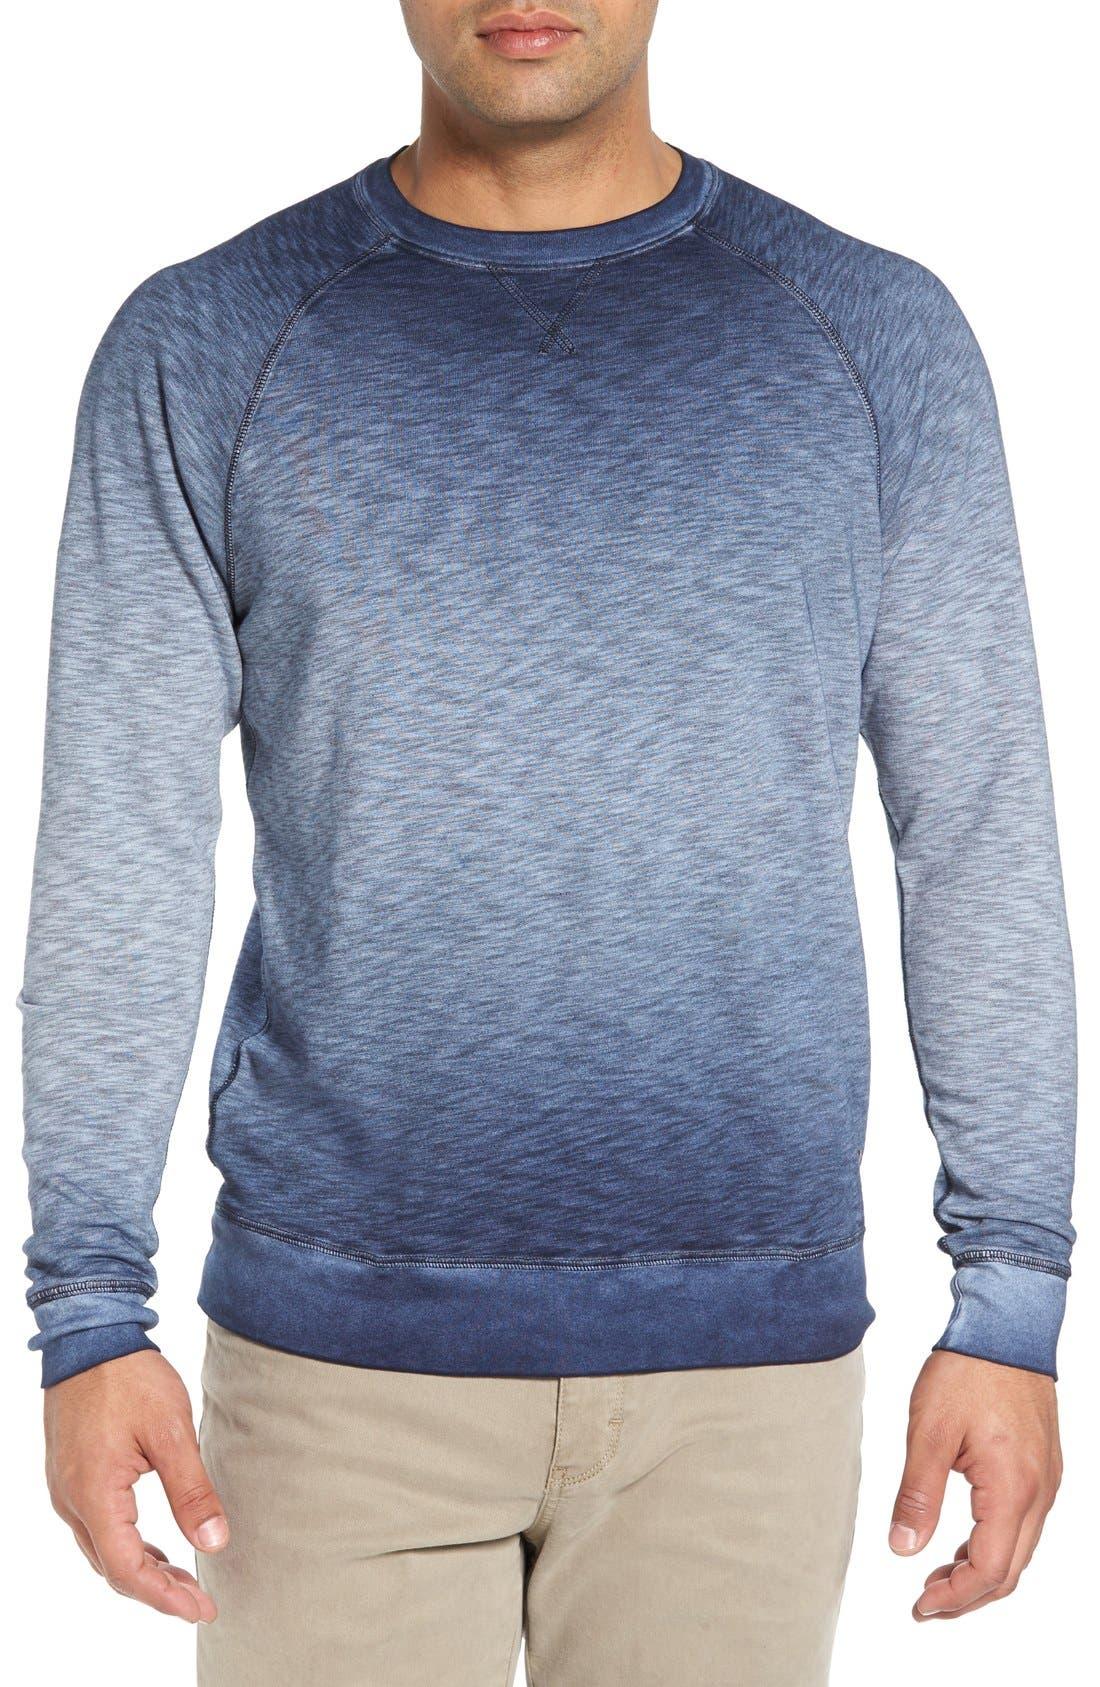 Main Image - Tommy Bahama 'Santiago' Ombré Crewneck Sweatshirt